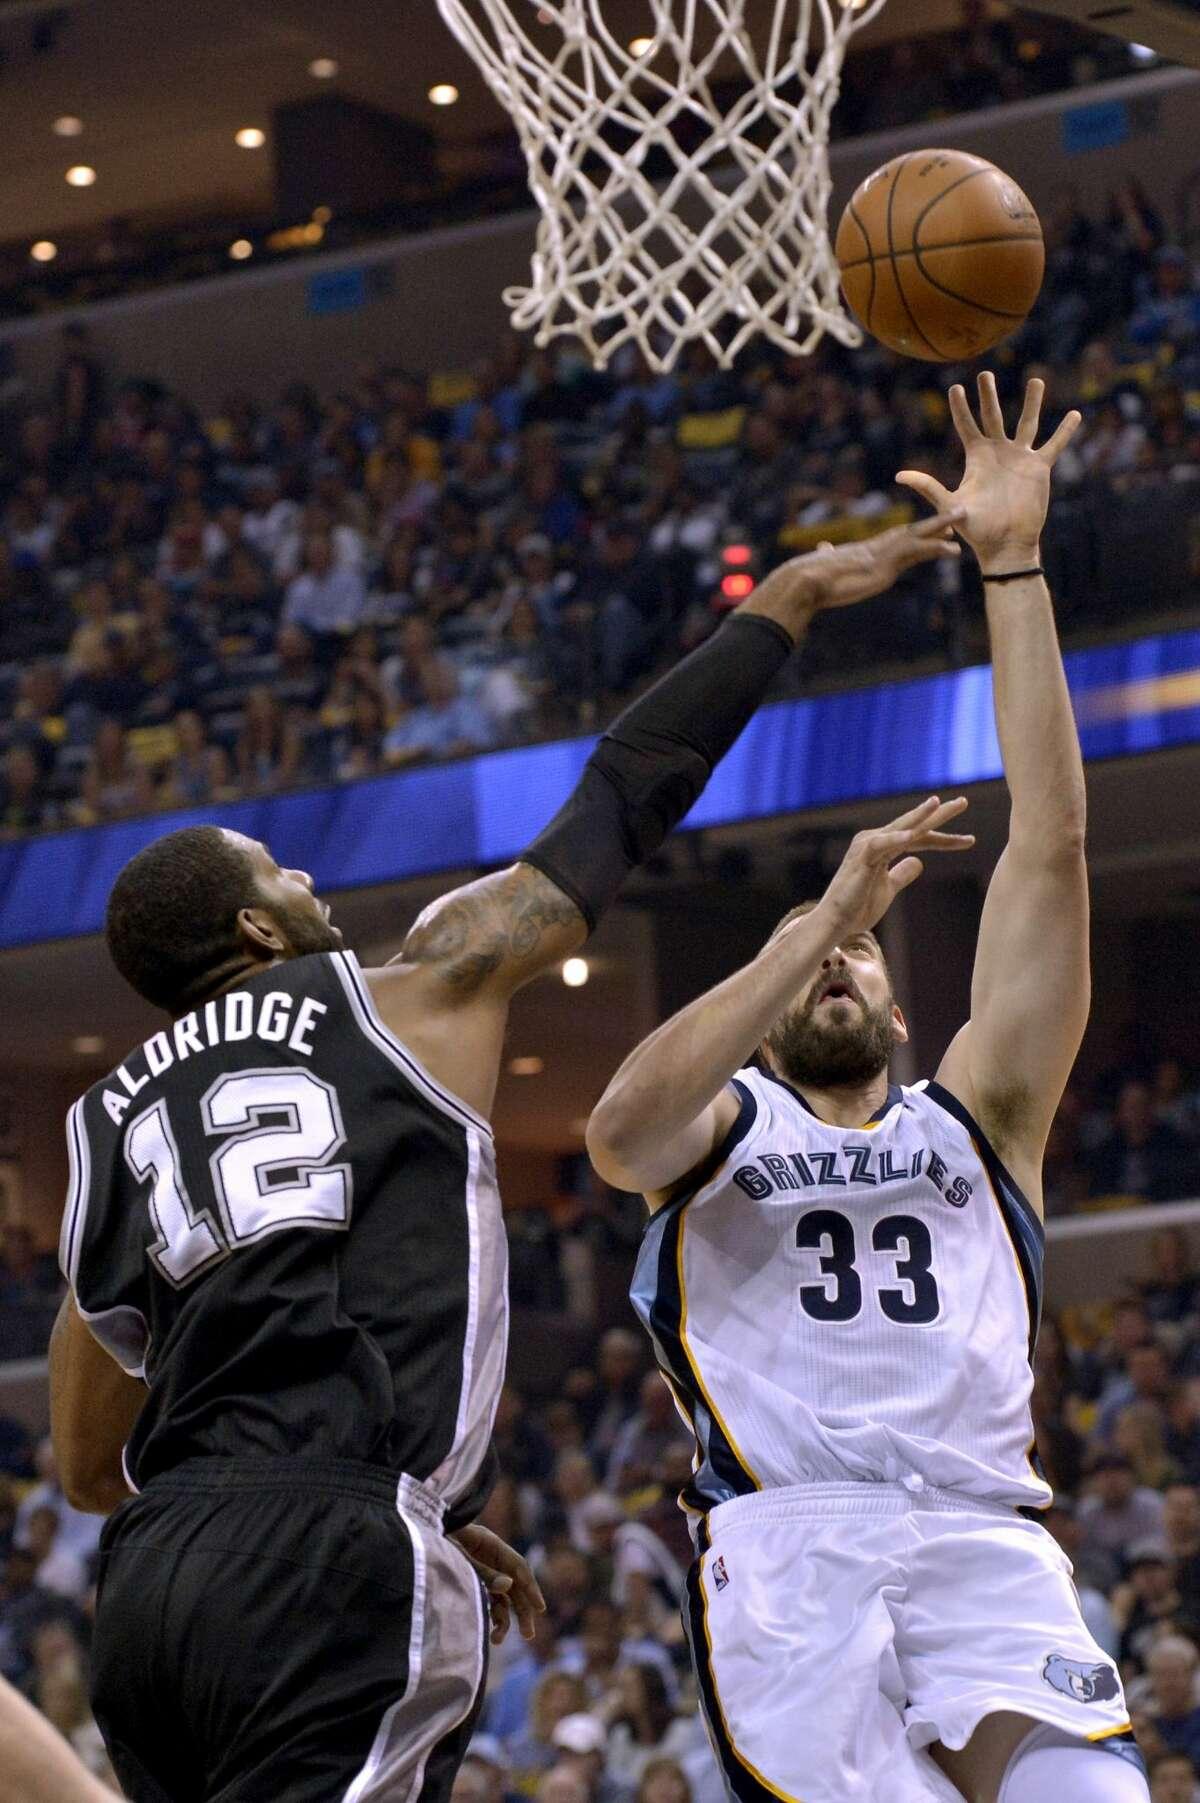 Memphis Grizzlies center Marc Gasol (33) shoots against San Antonio Spurs forward LaMarcus Aldridge (12) during the first half of Game 4 in an NBA basketball first-round playoff series Saturday, April 22, 2017, in Memphis, Tenn. (AP Photo/Brandon Dill)